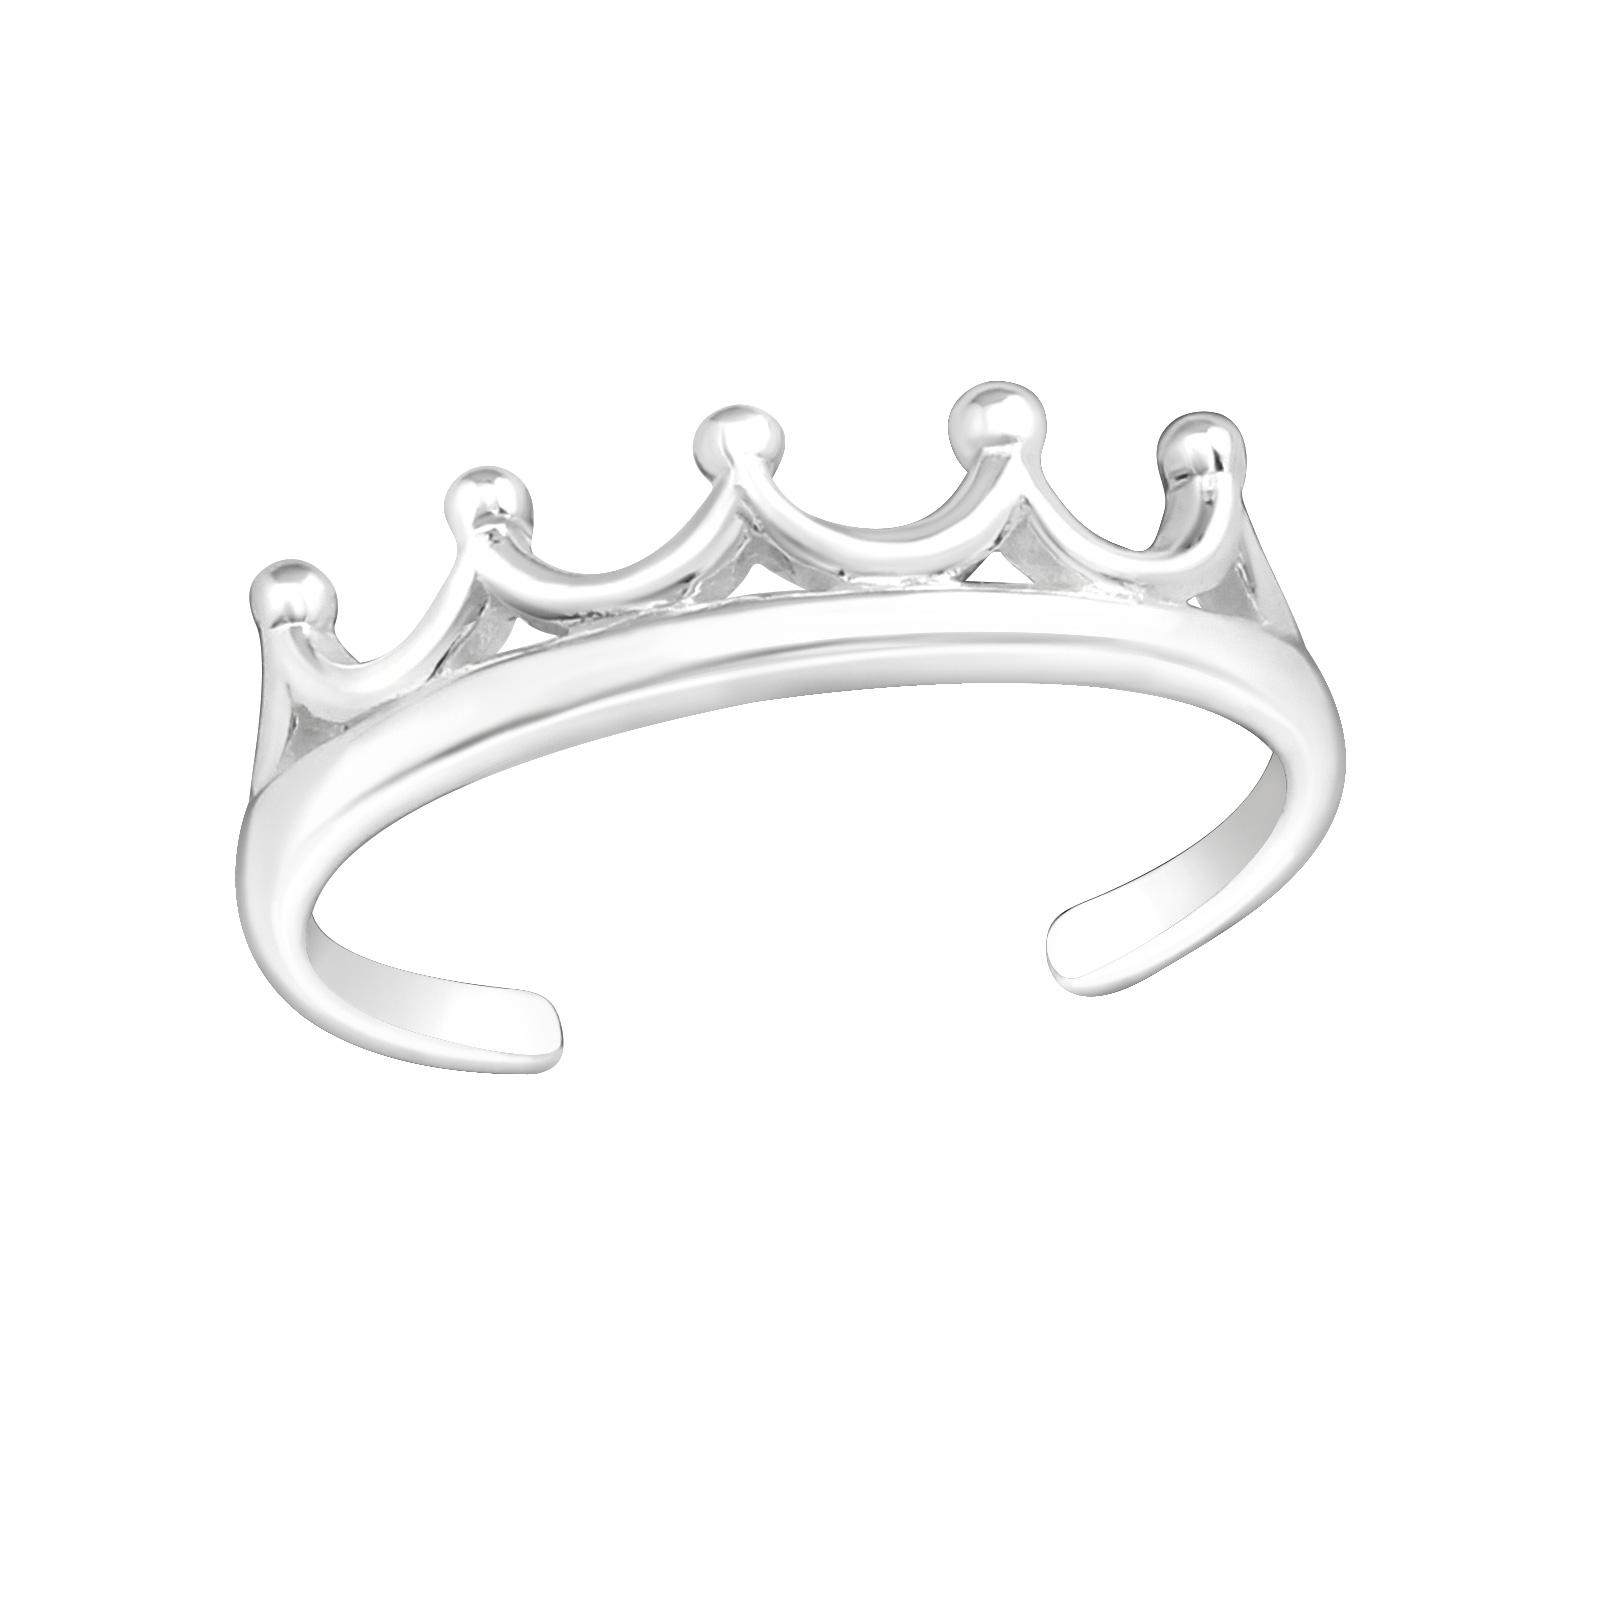 OLIVIE Prsteň NA NOHU KORUNKA 4002 Ag 925; ≤0,7 g